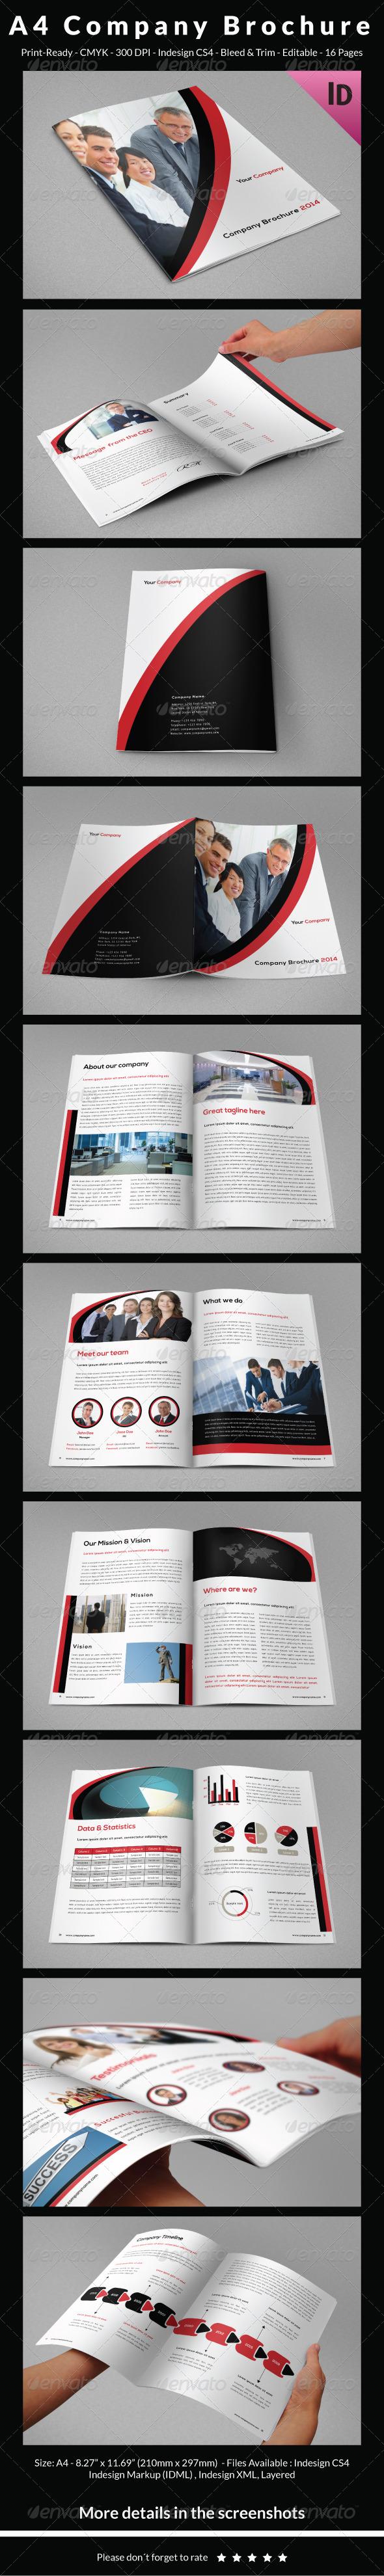 A4 Company Brochure  - Corporate Brochures